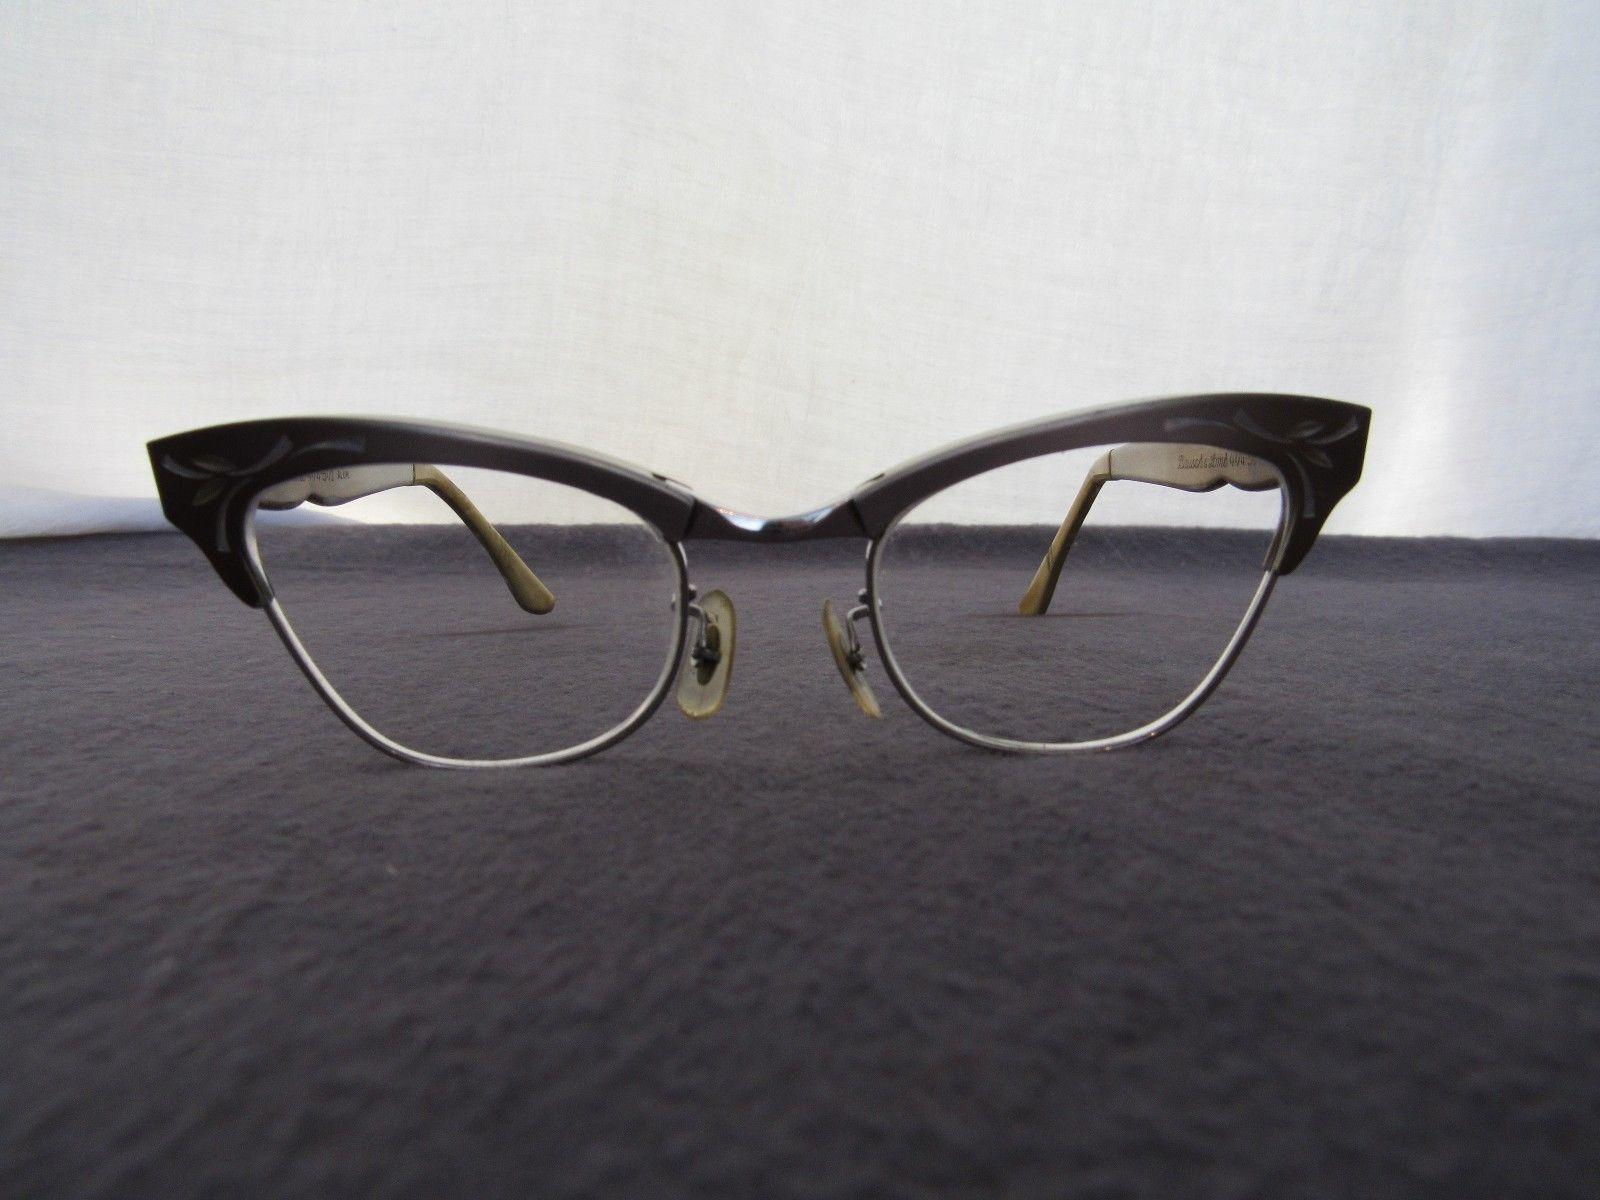 Vtg 1950's Bausch Lomb Cat Eye Ladies Glasses BiFocals 4 1/4 - 5 1/2